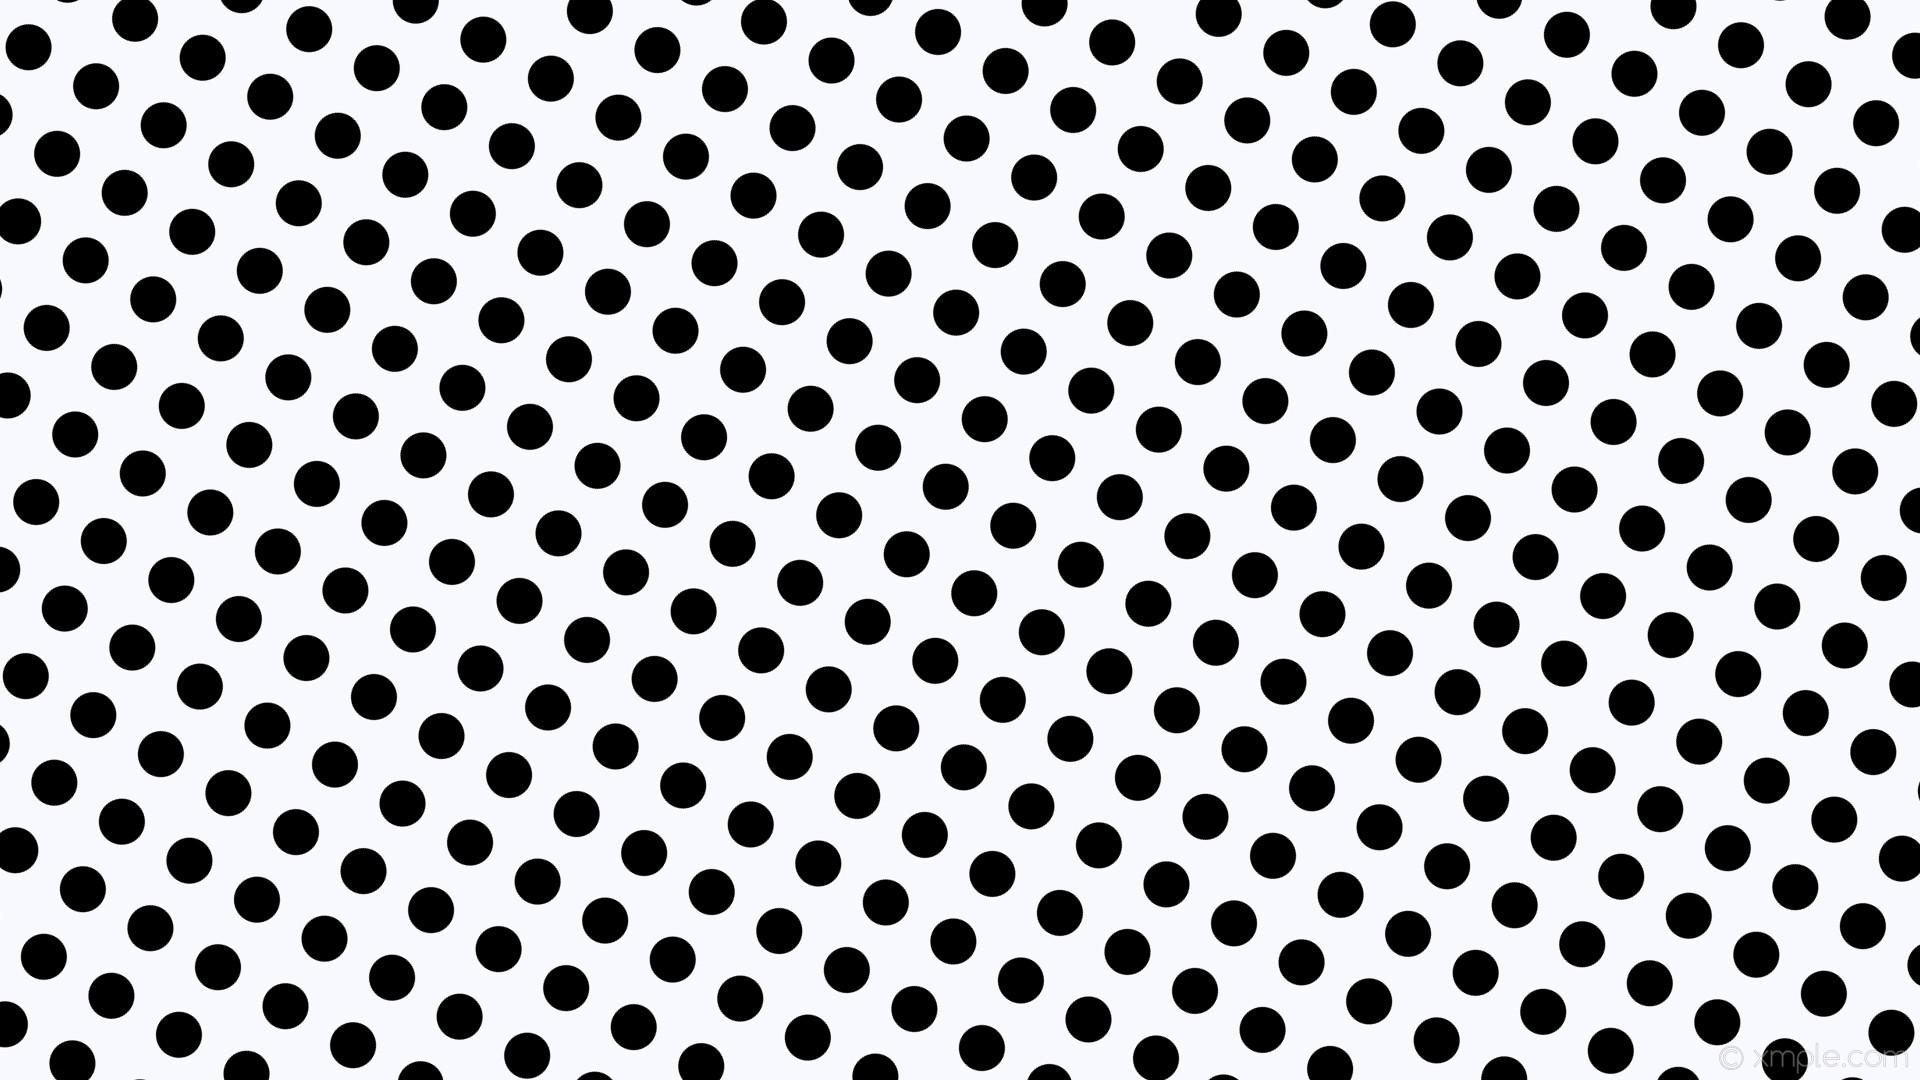 wallpaper white polka dots spots black ghost white #f8f8ff #000000 150°  46px 78px